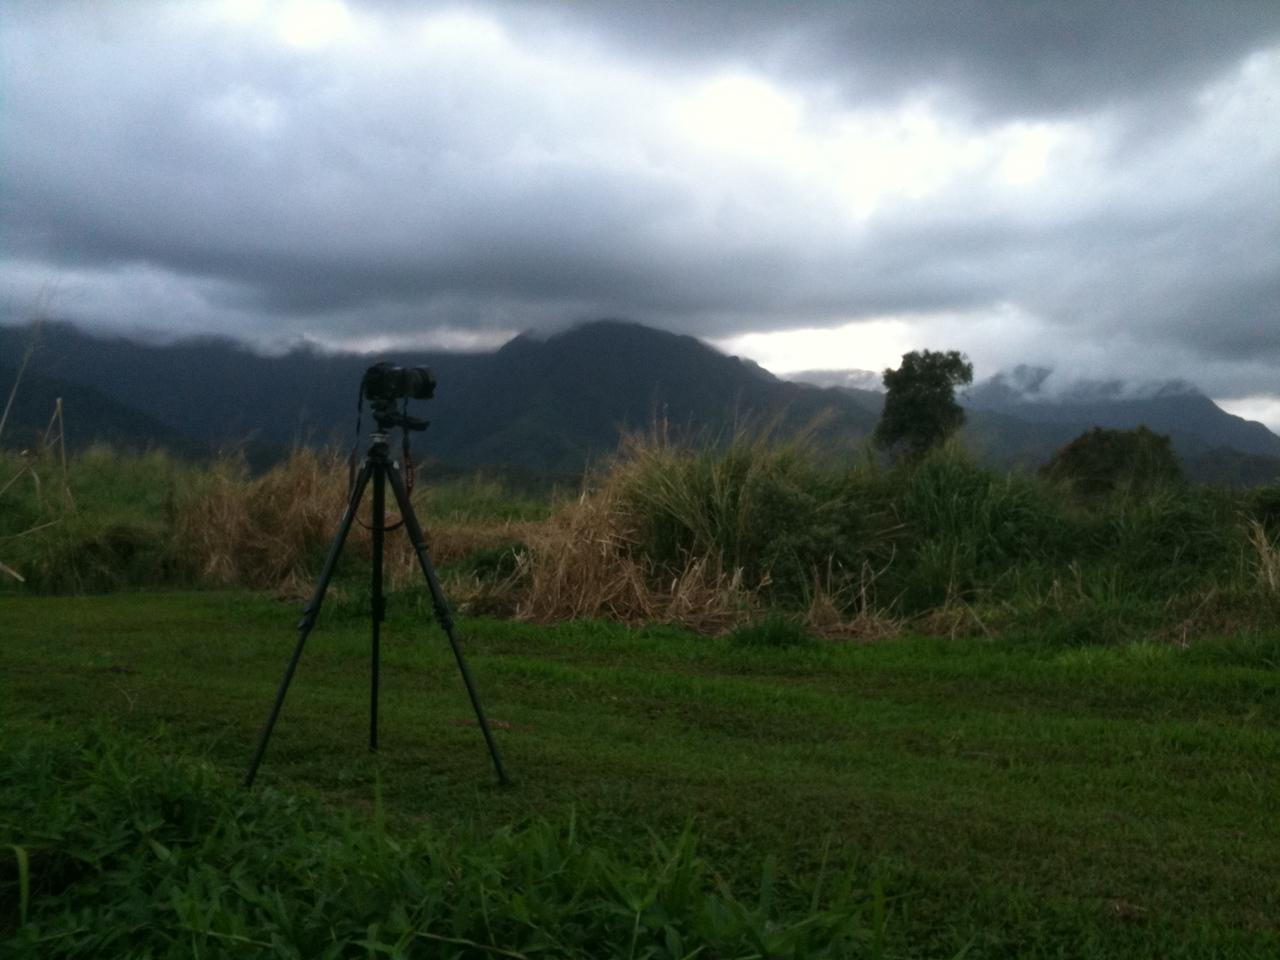 Sunset time-lapse setup facing west toward Kaliki peak, Kauai, HI. 2/12/2010.